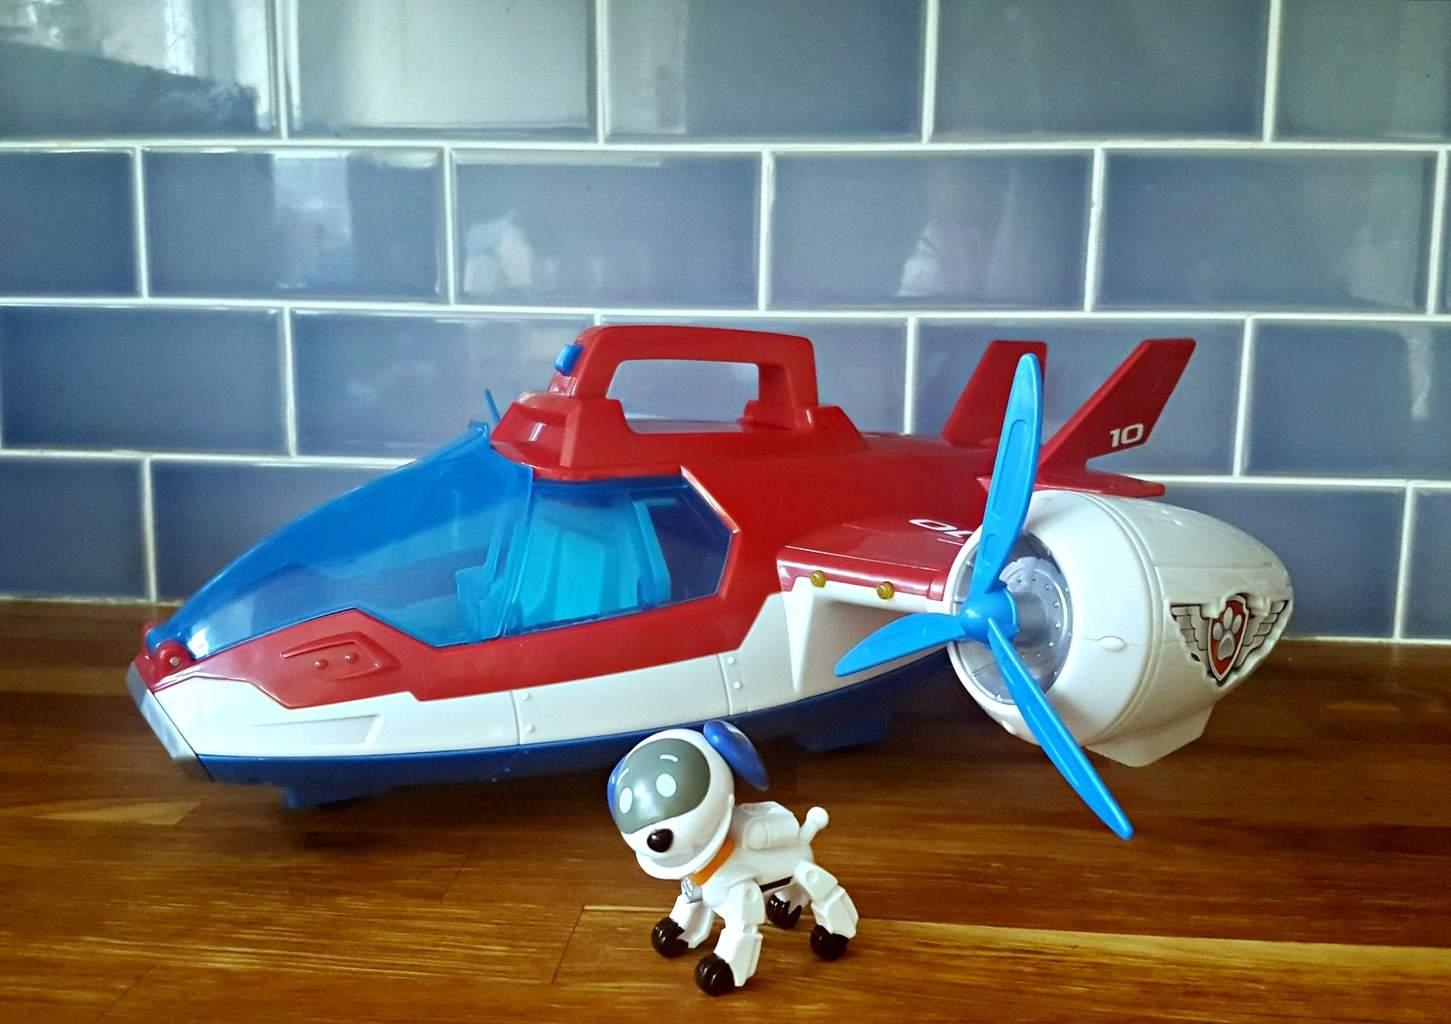 pp-air-patroller-plane-dog